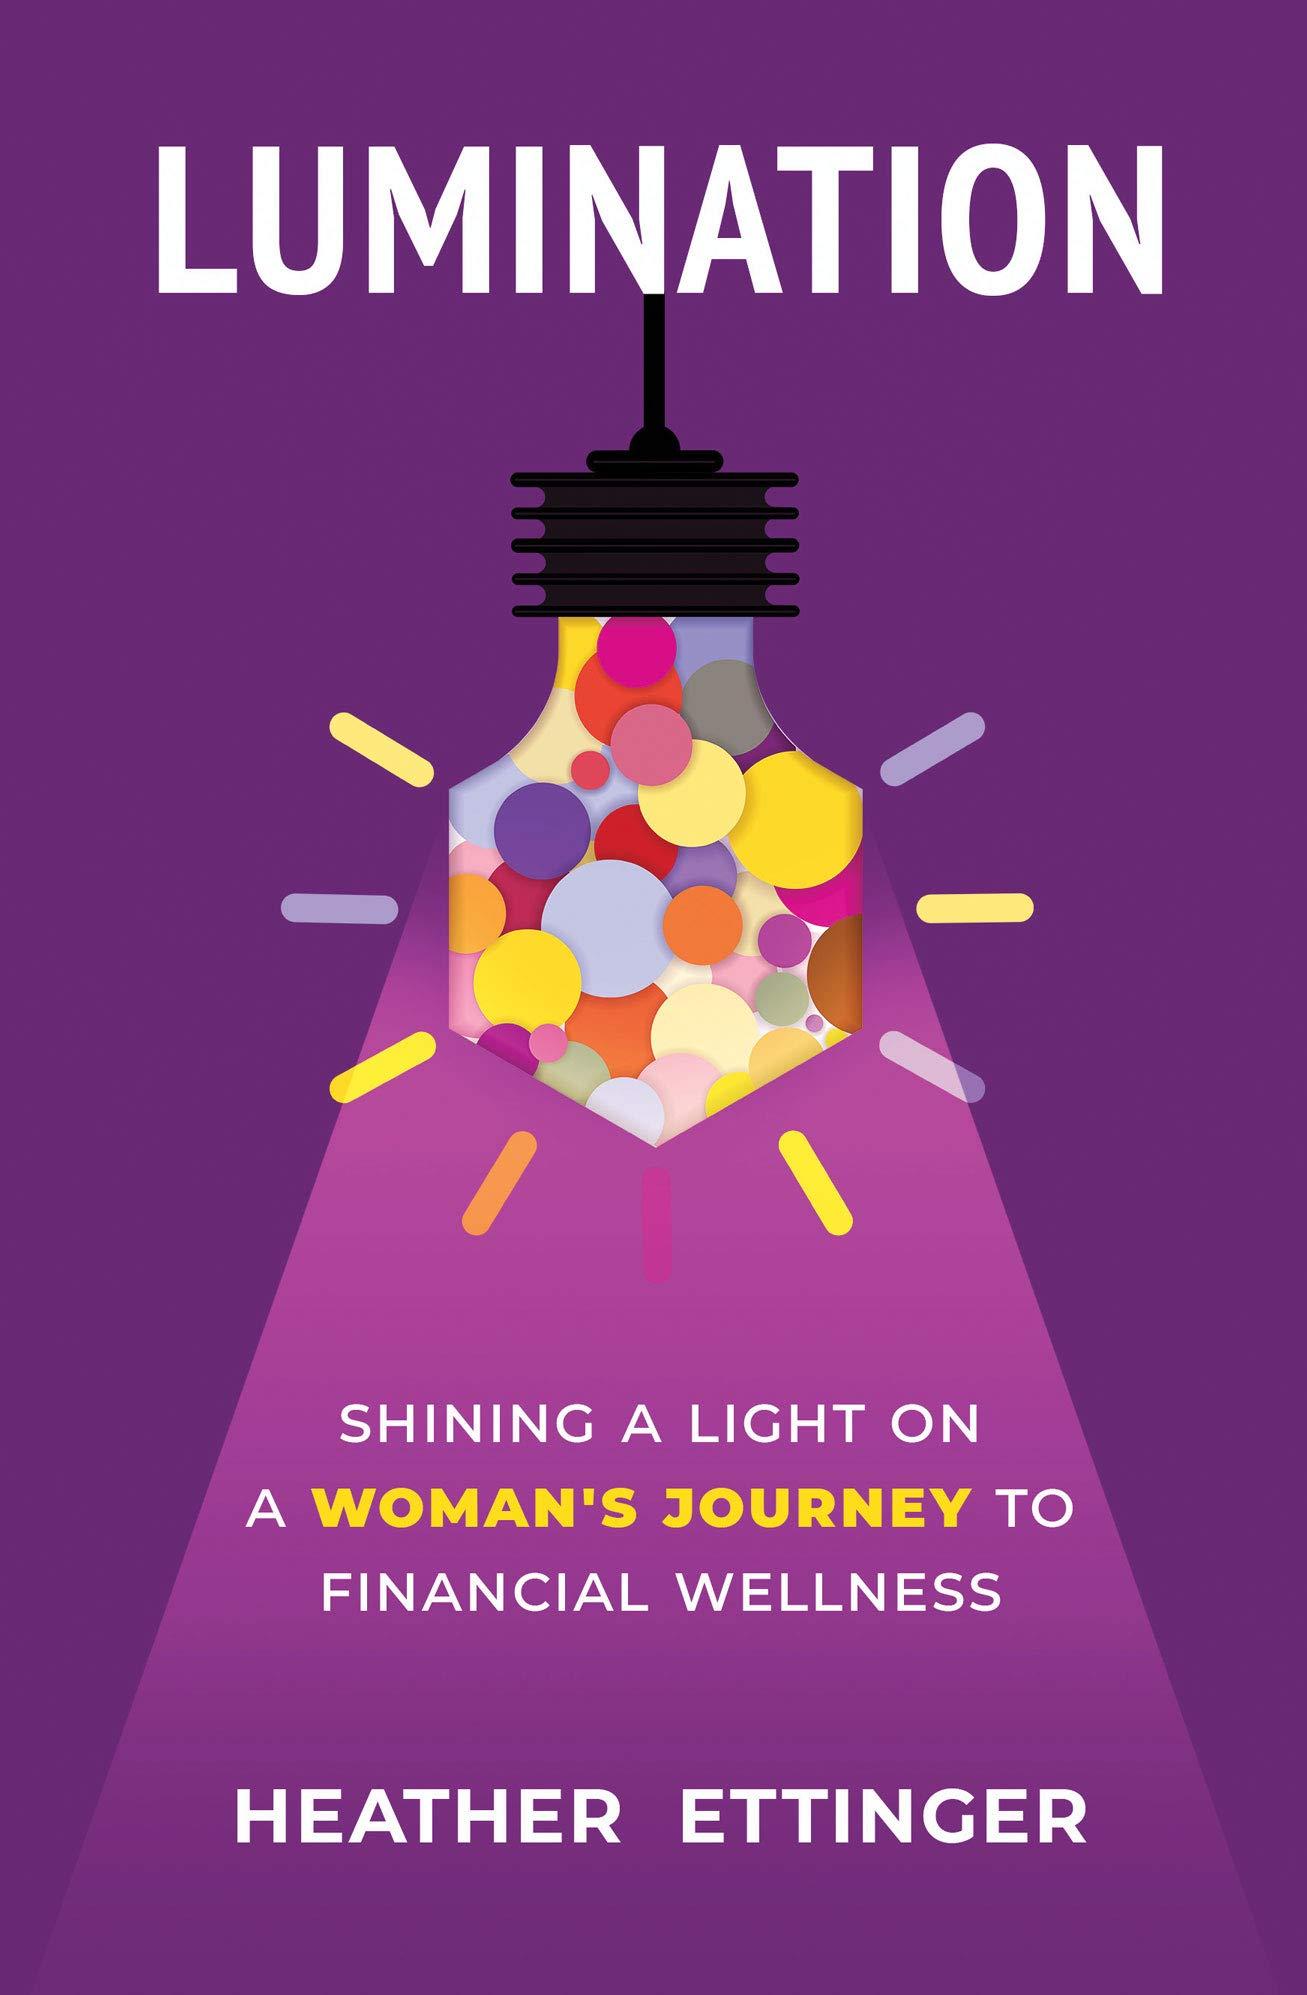 Lumination: Shining a Light on a Woman's Journey to Financial Wellness